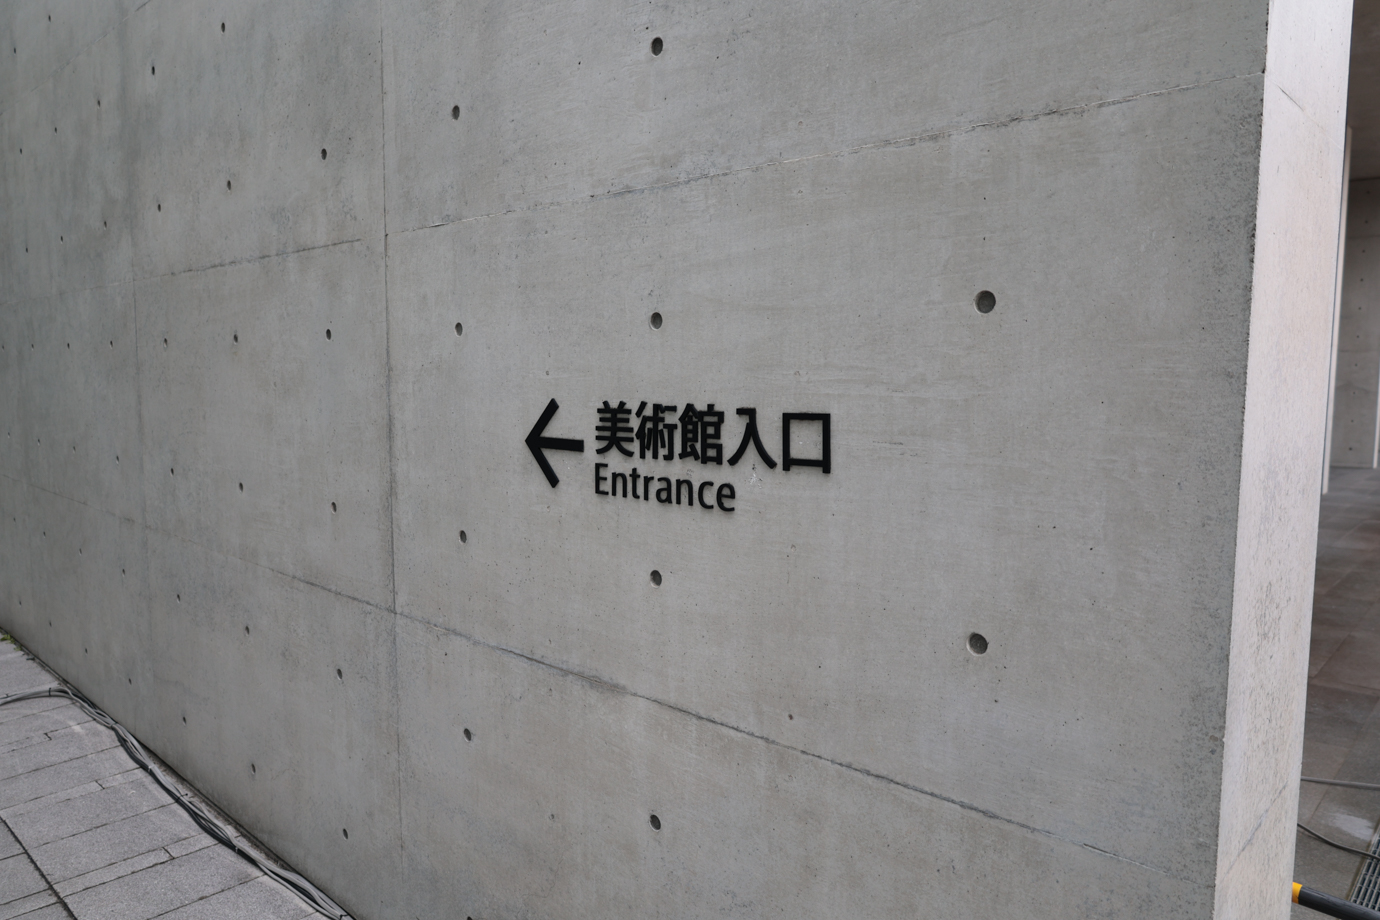 美術館入口の案内